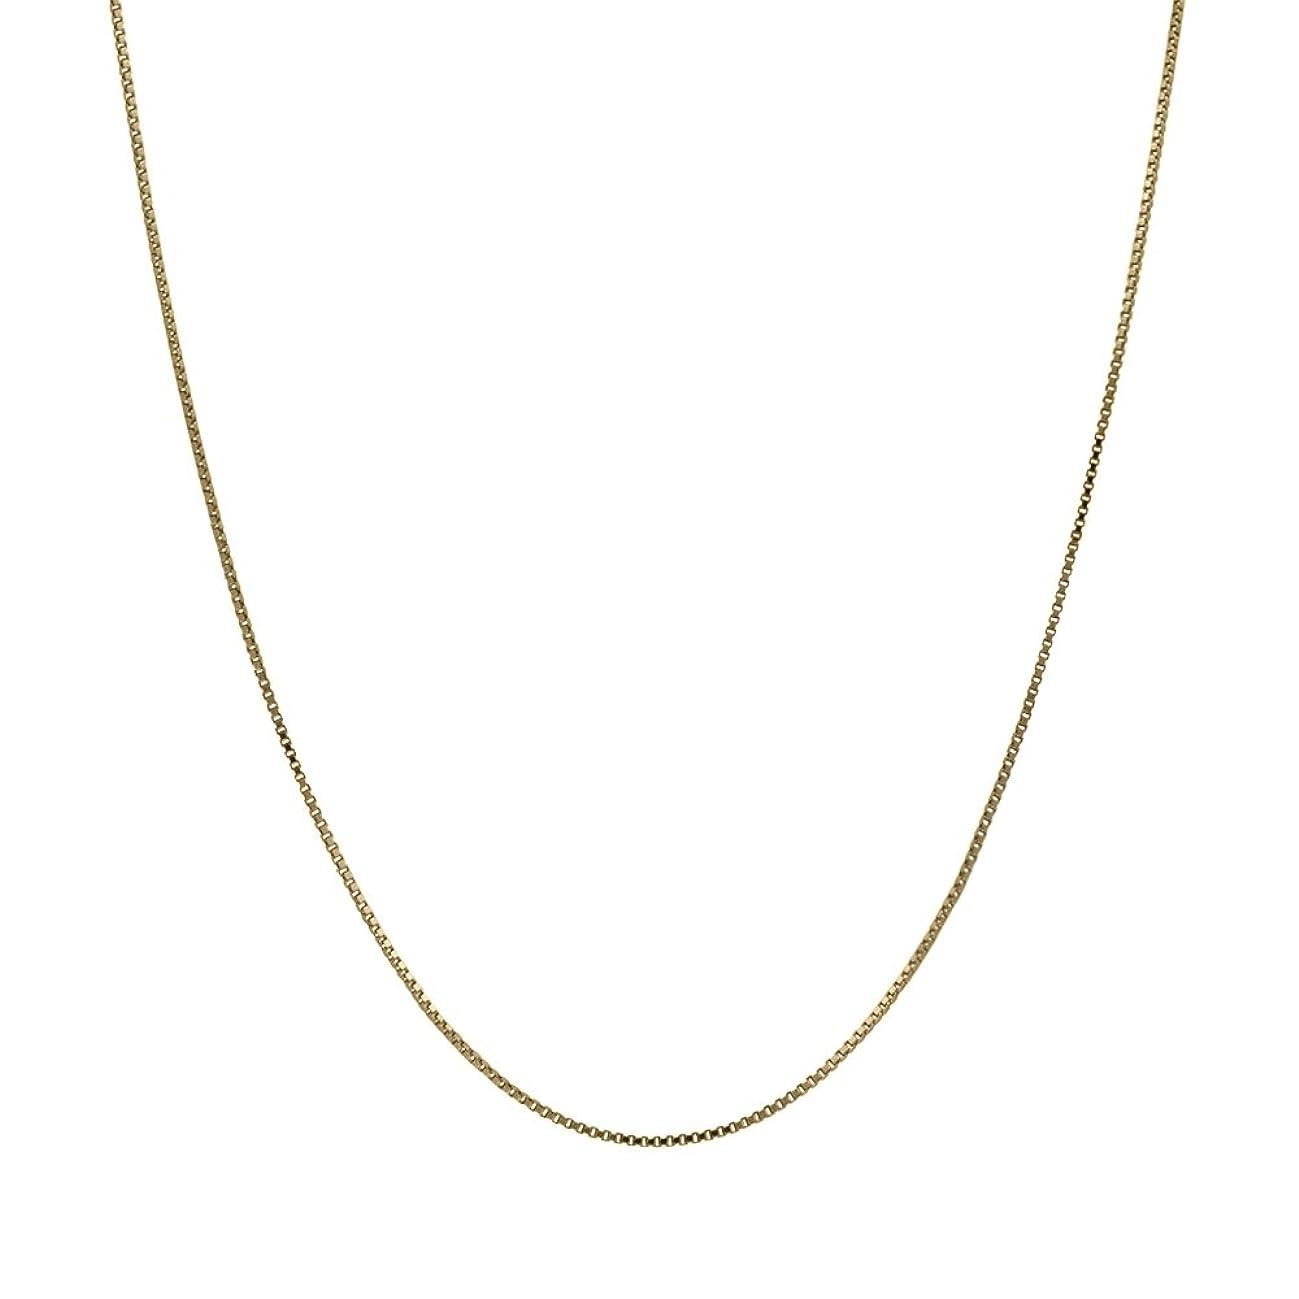 Honolulu Jewelry Company 14K Solid Yellow Gold Box Chain Necklace